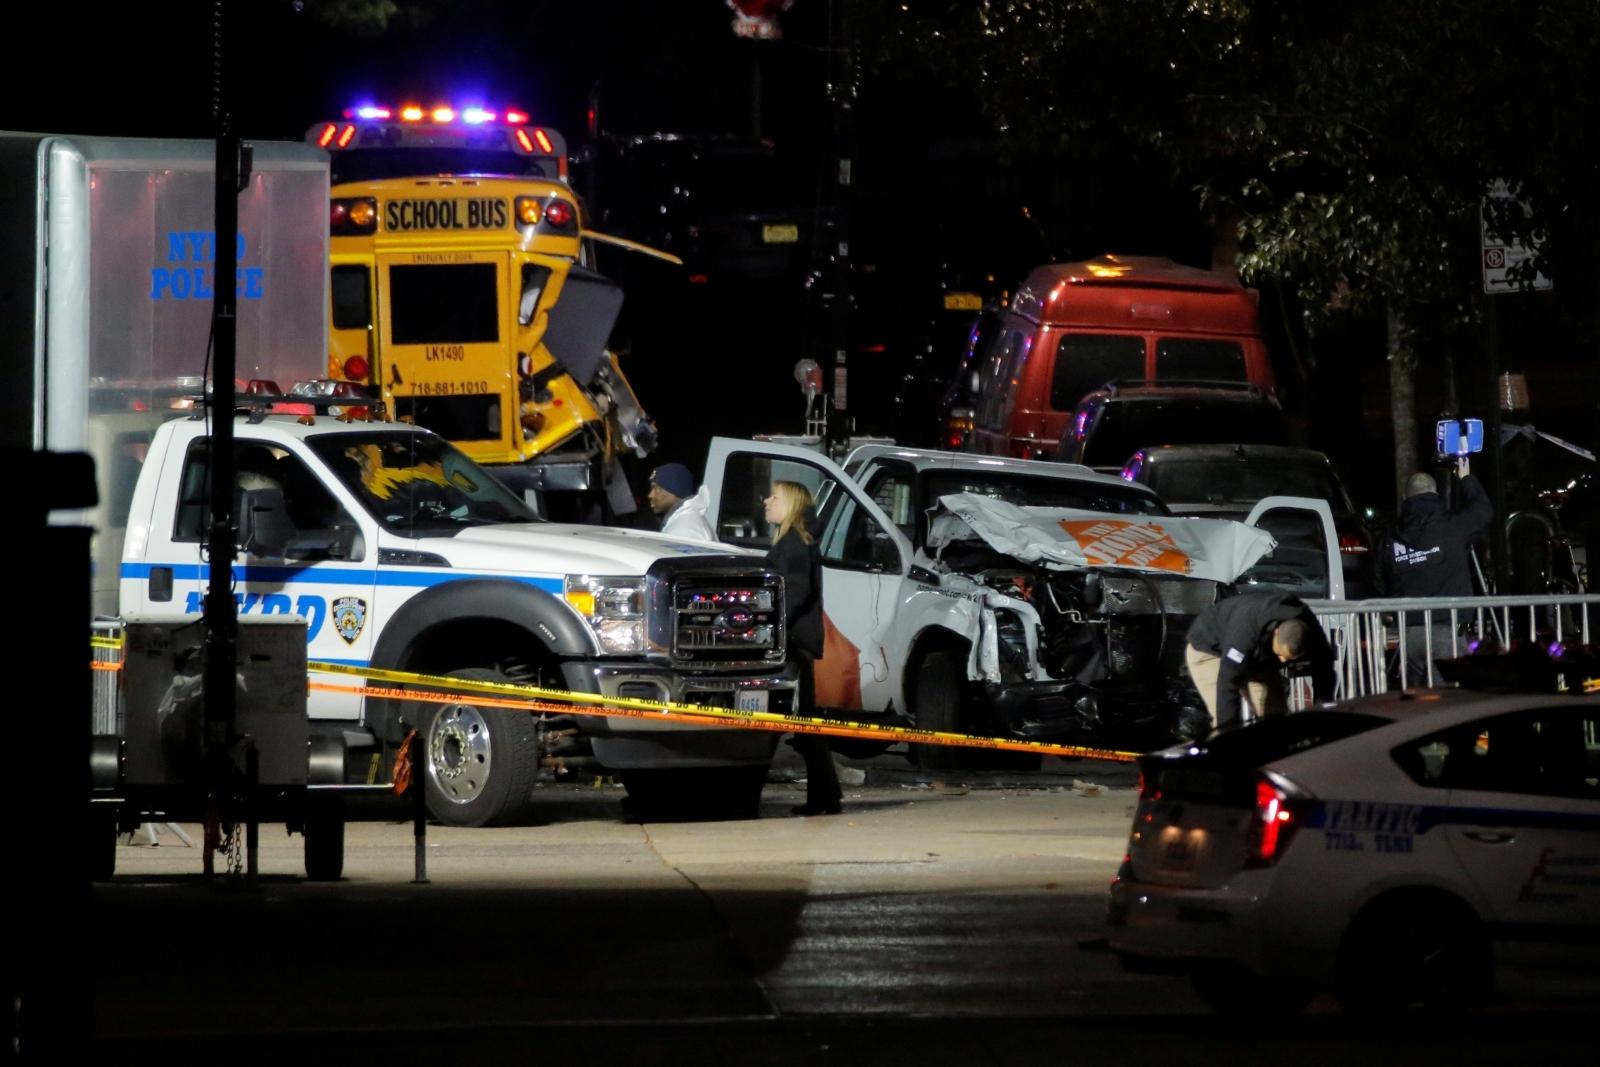 New York Truck Attack